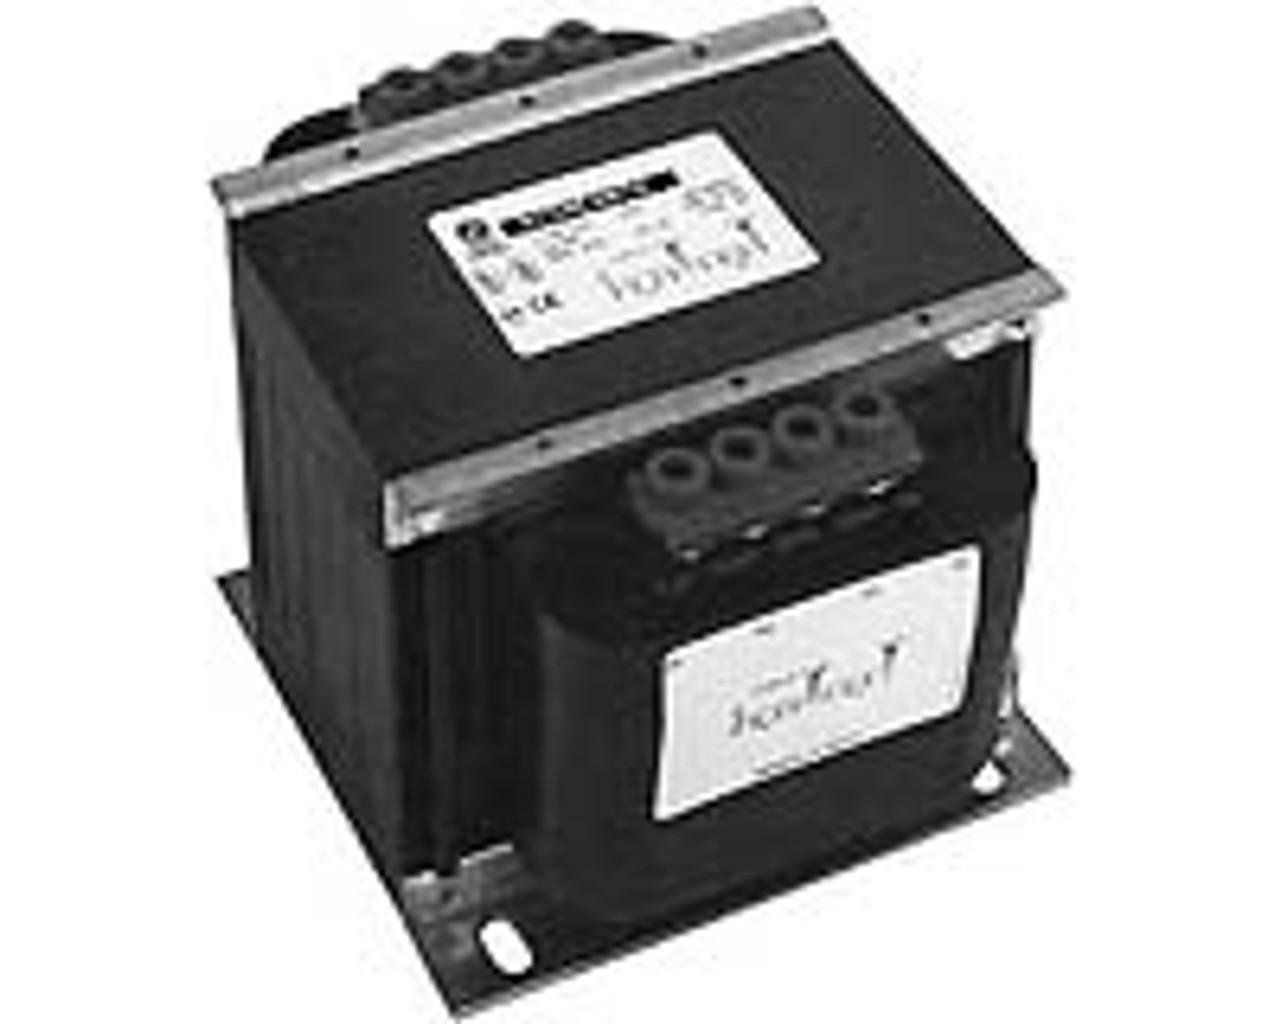 GE 9T58K0062G48 - 0.05 KVA 230/460/575 To 115/95 Volt 1PH Transformer